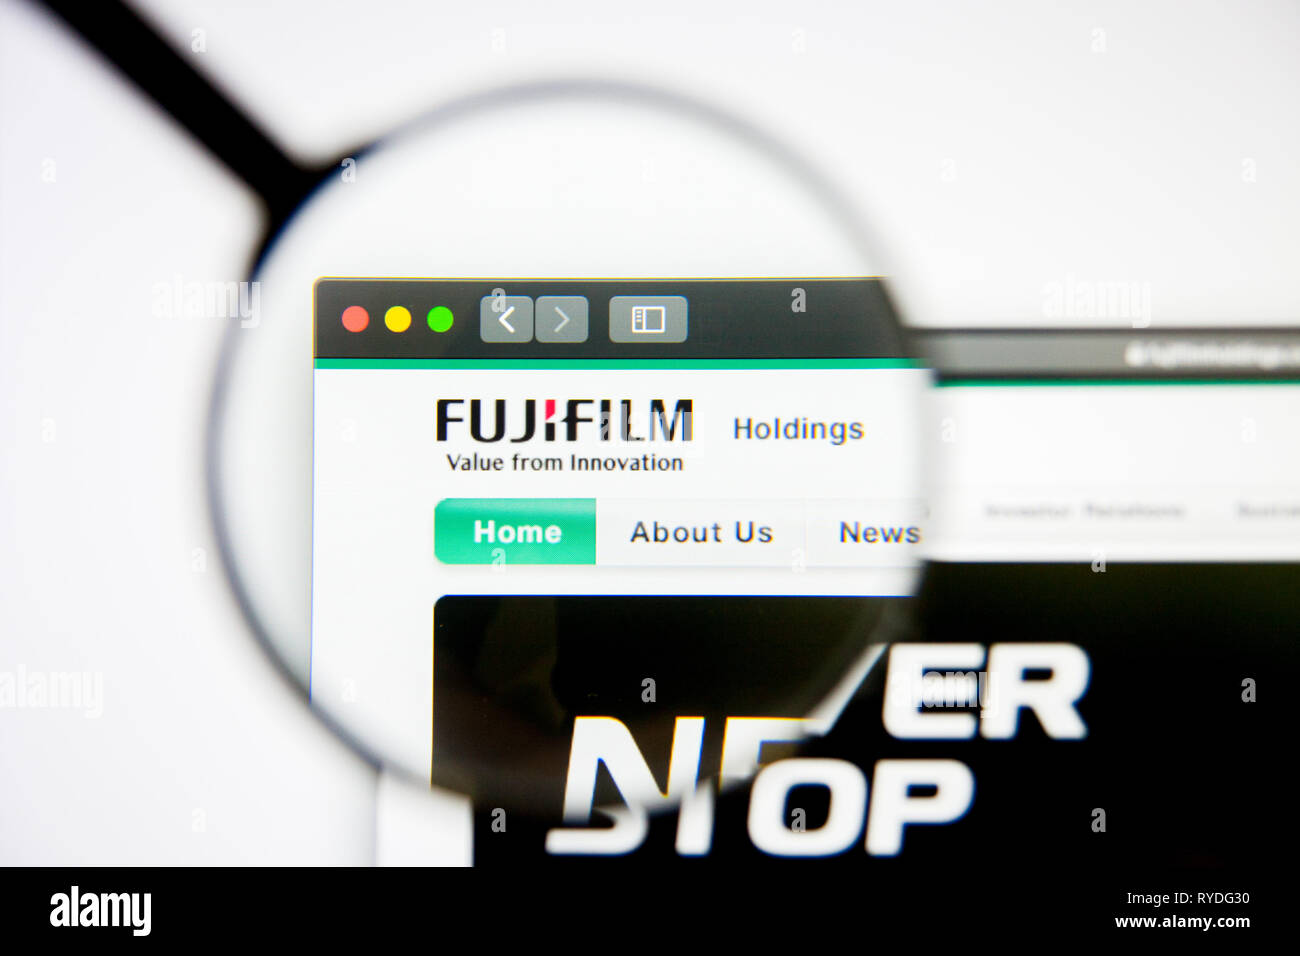 Los Angeles, California, USA - 5 March 2019: Fujifilm Holdings website homepage. Fujifilm Holdings logo visible on display screen, Illustrative - Stock Image